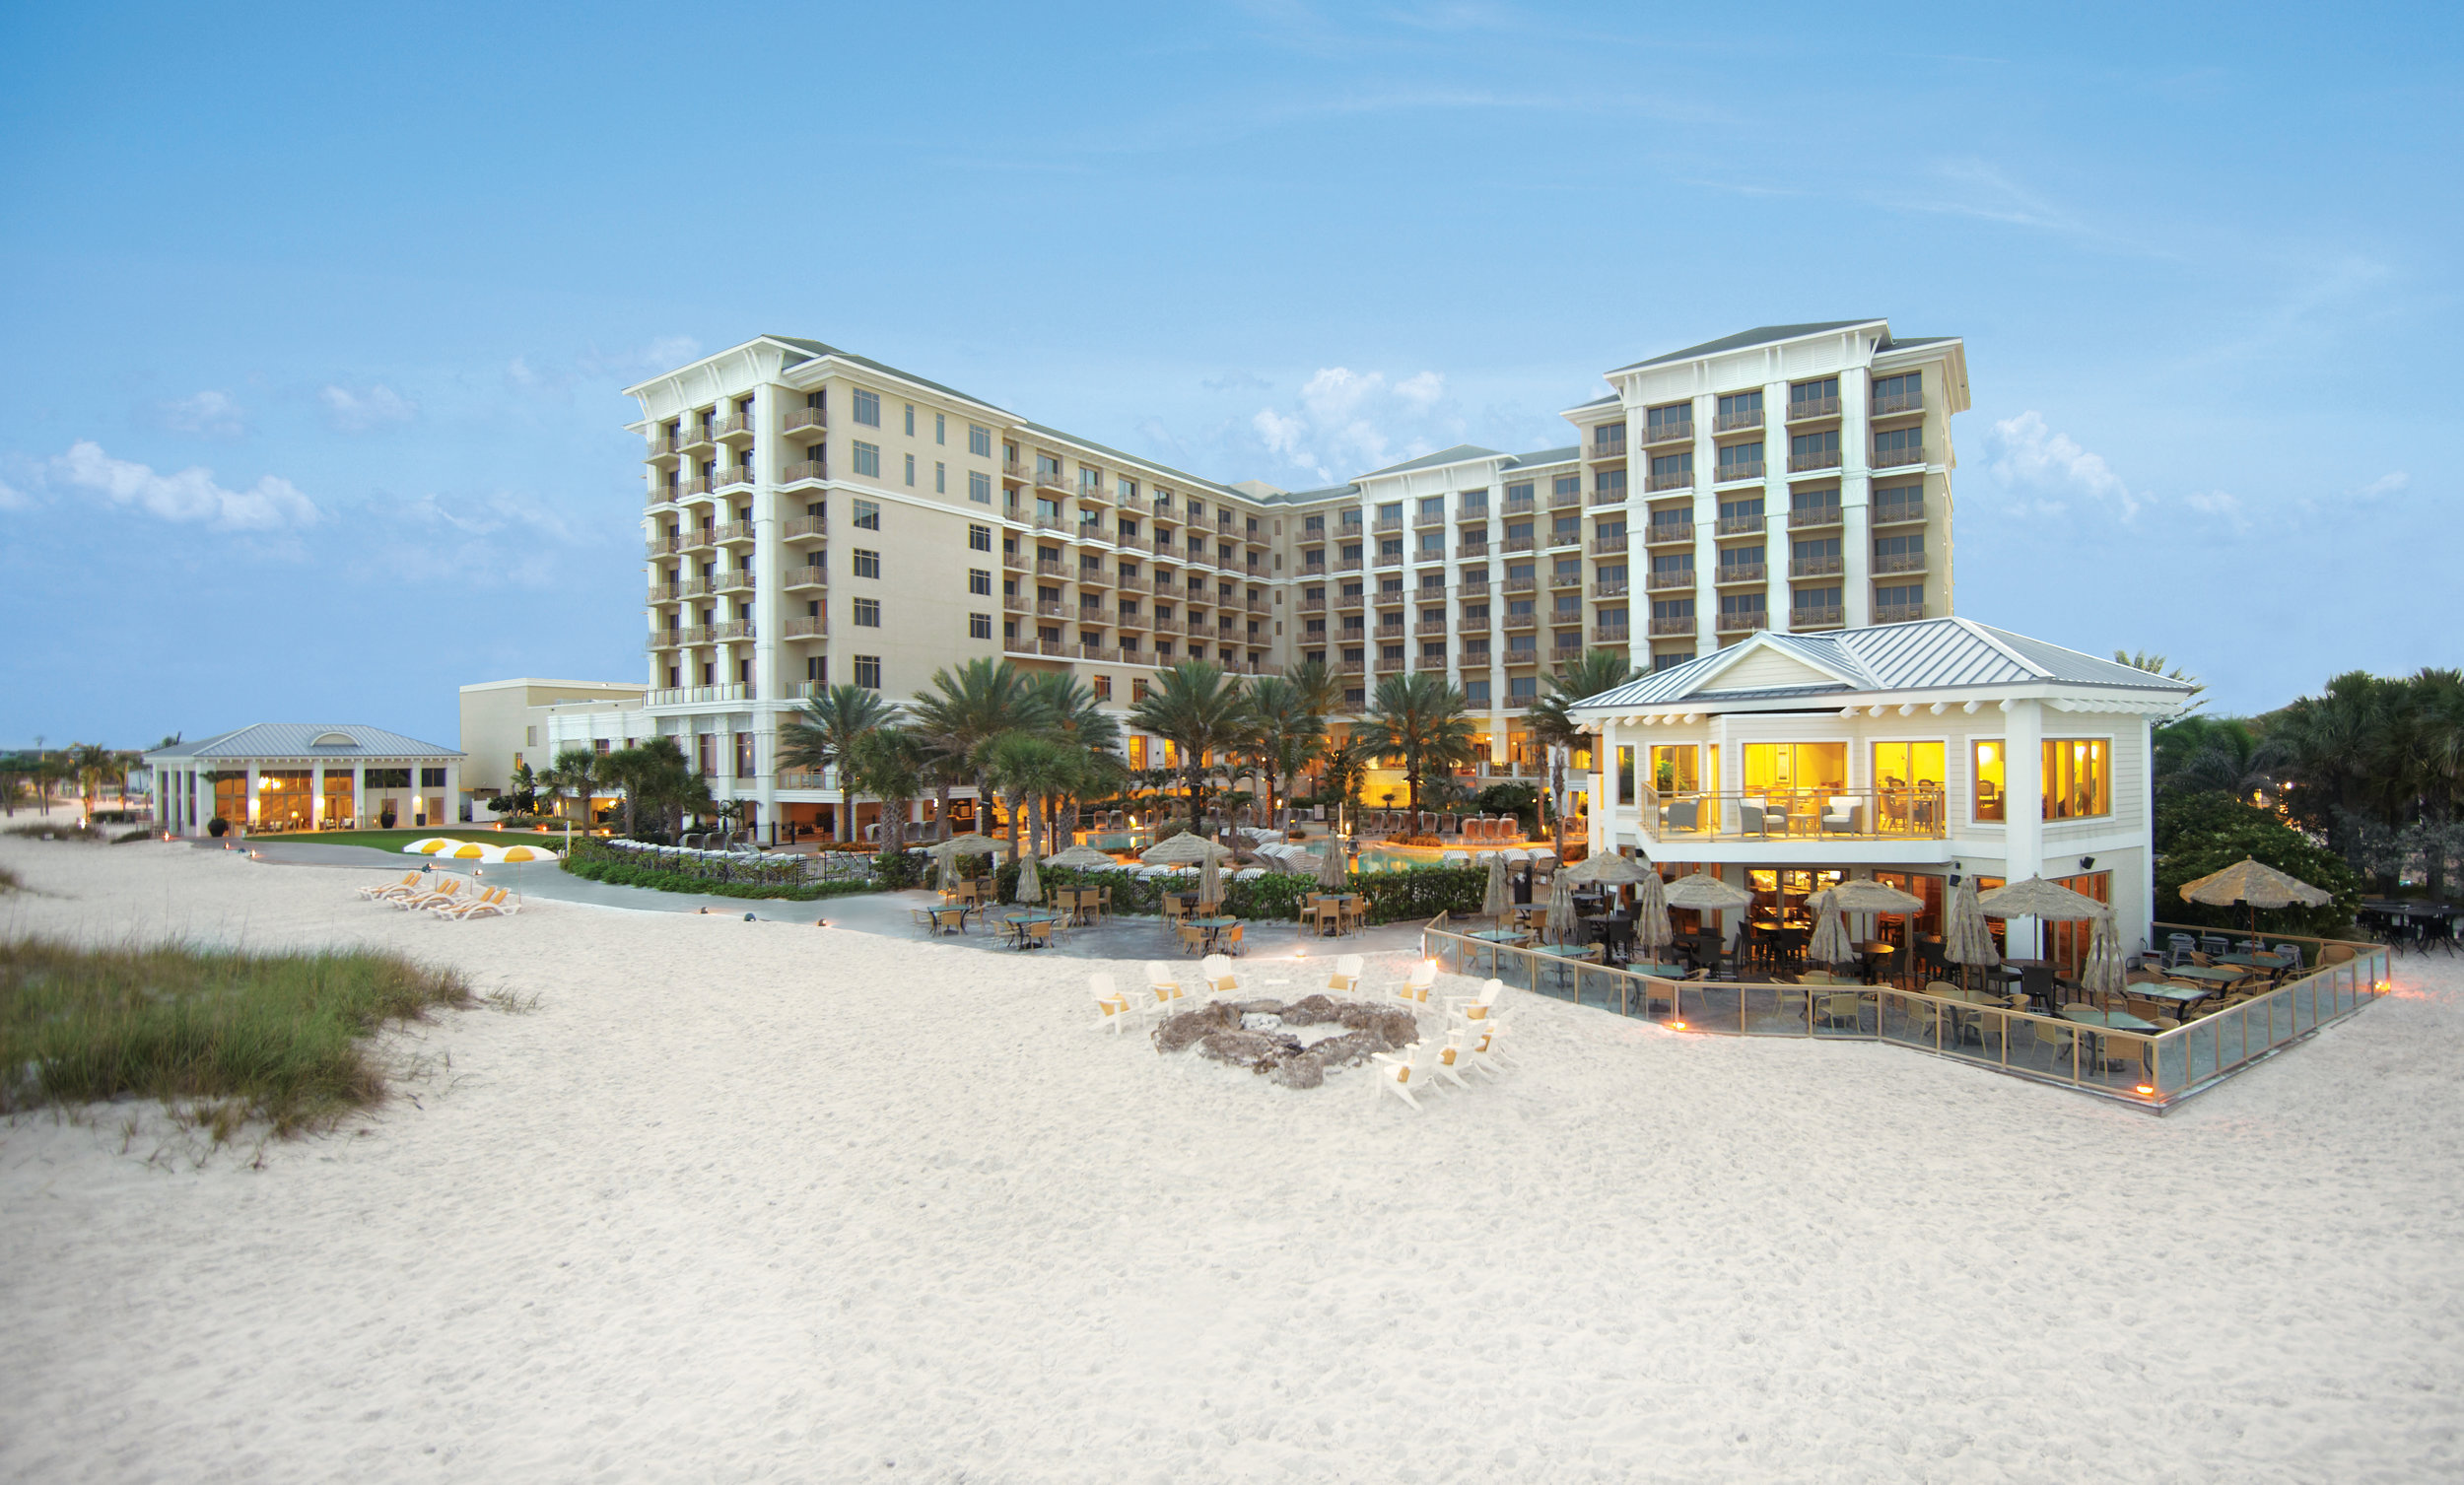 Sandpearl Resort Black Friday Deals on Hotels